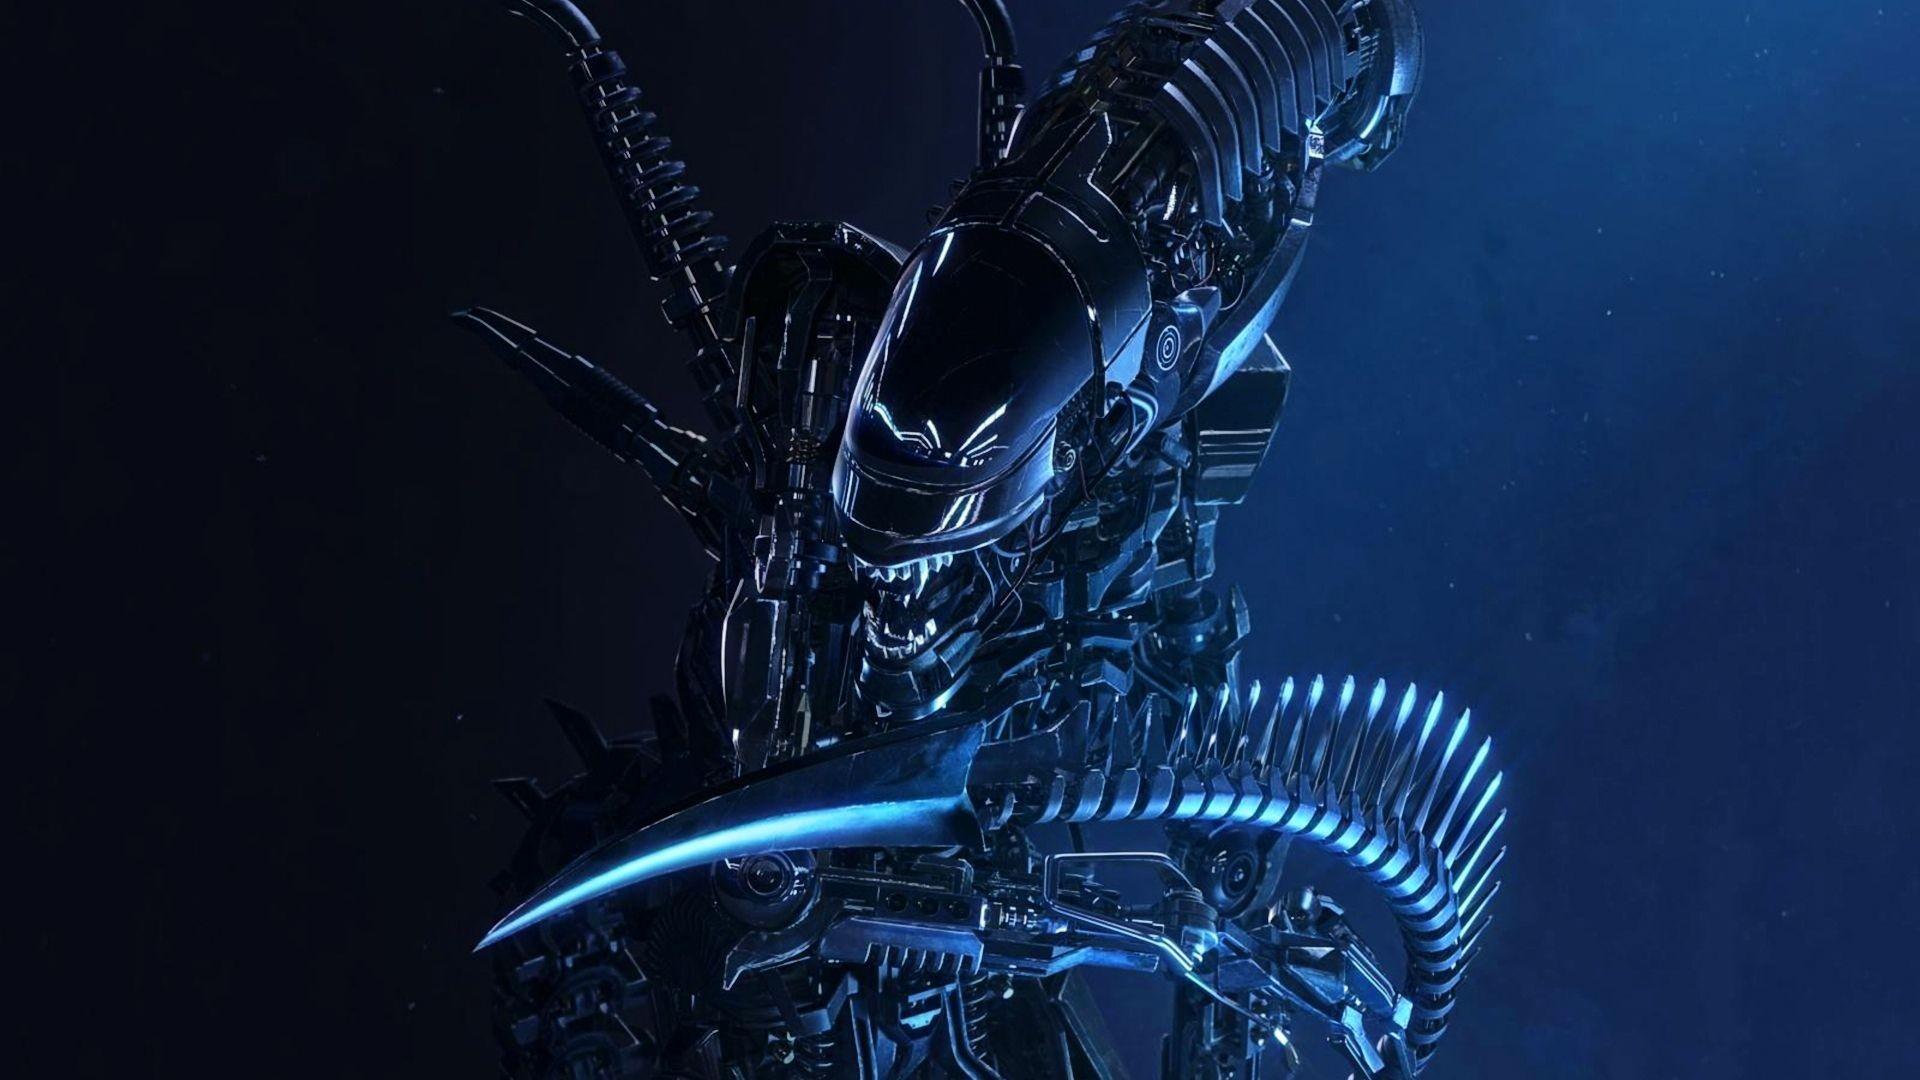 Res: 1920x1080, Aliens Wallpaper Photo